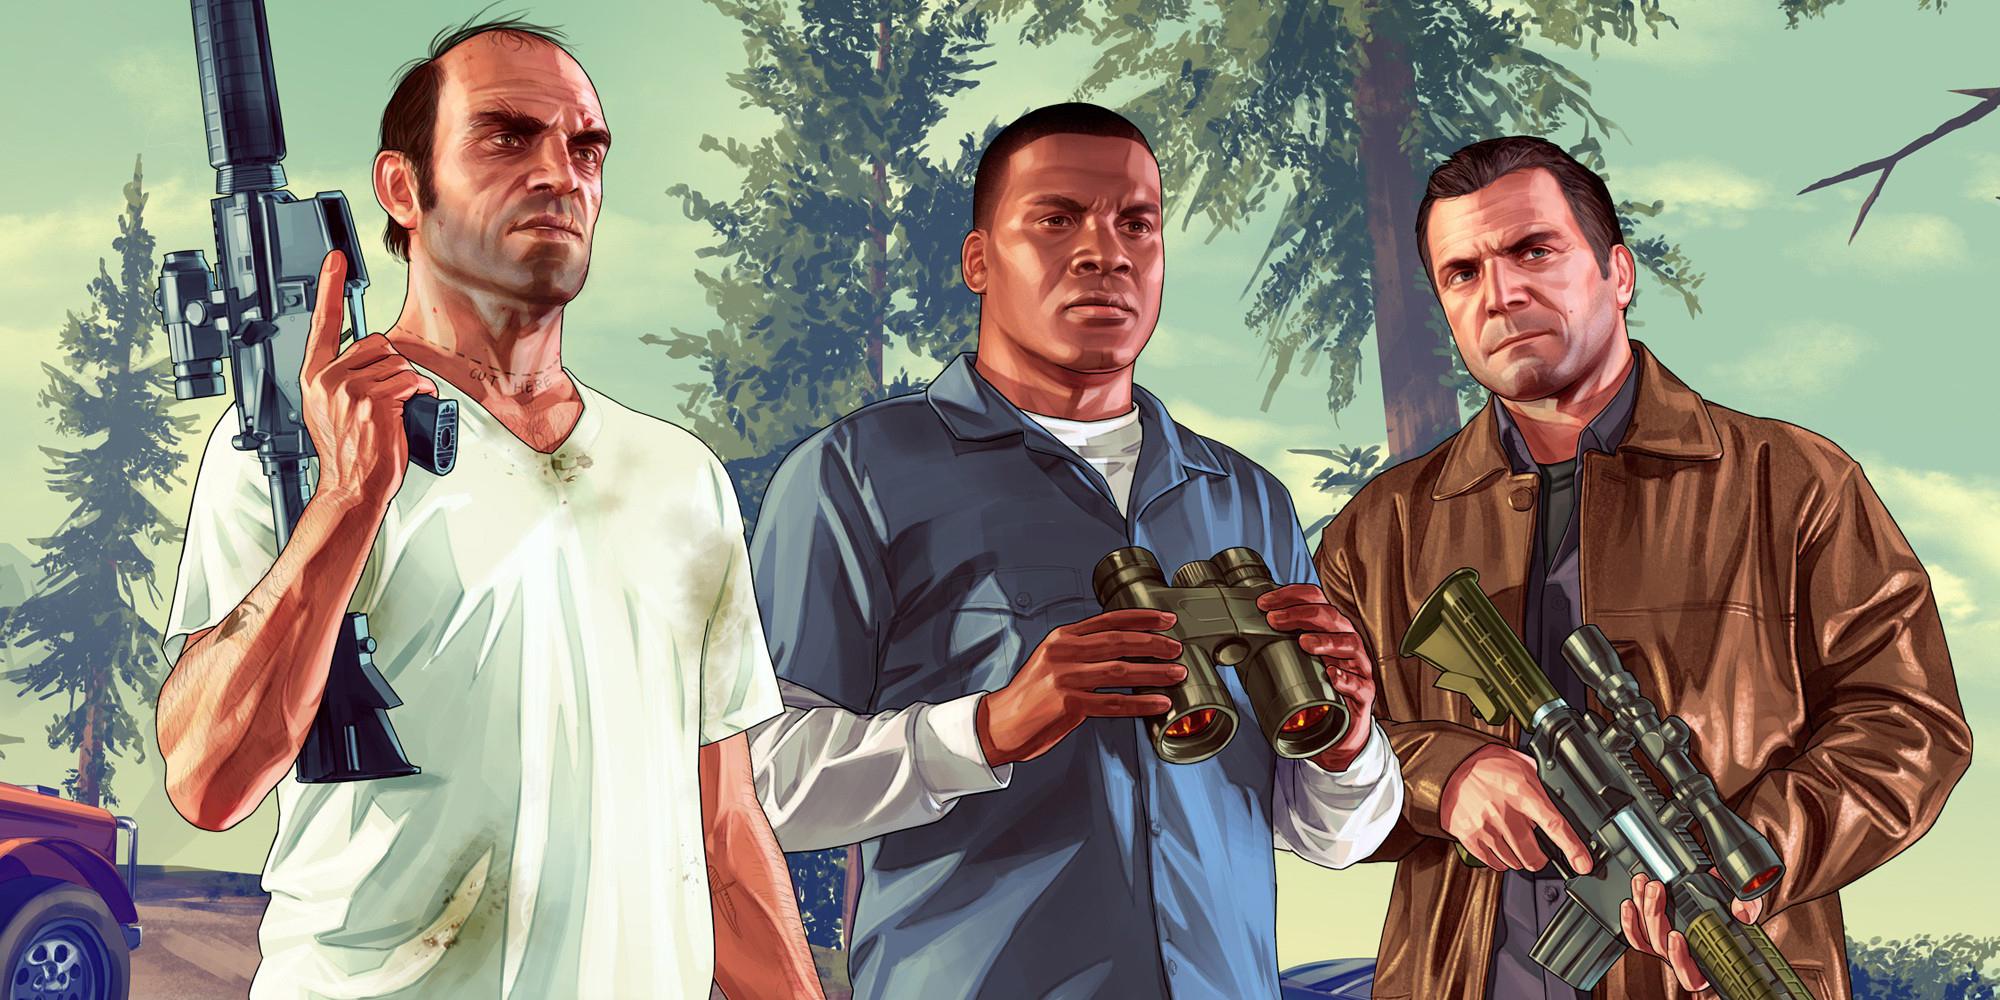 Rockstar Games wird wahrscheinlich Grand Theft Auto 6 offiziell ankündigen